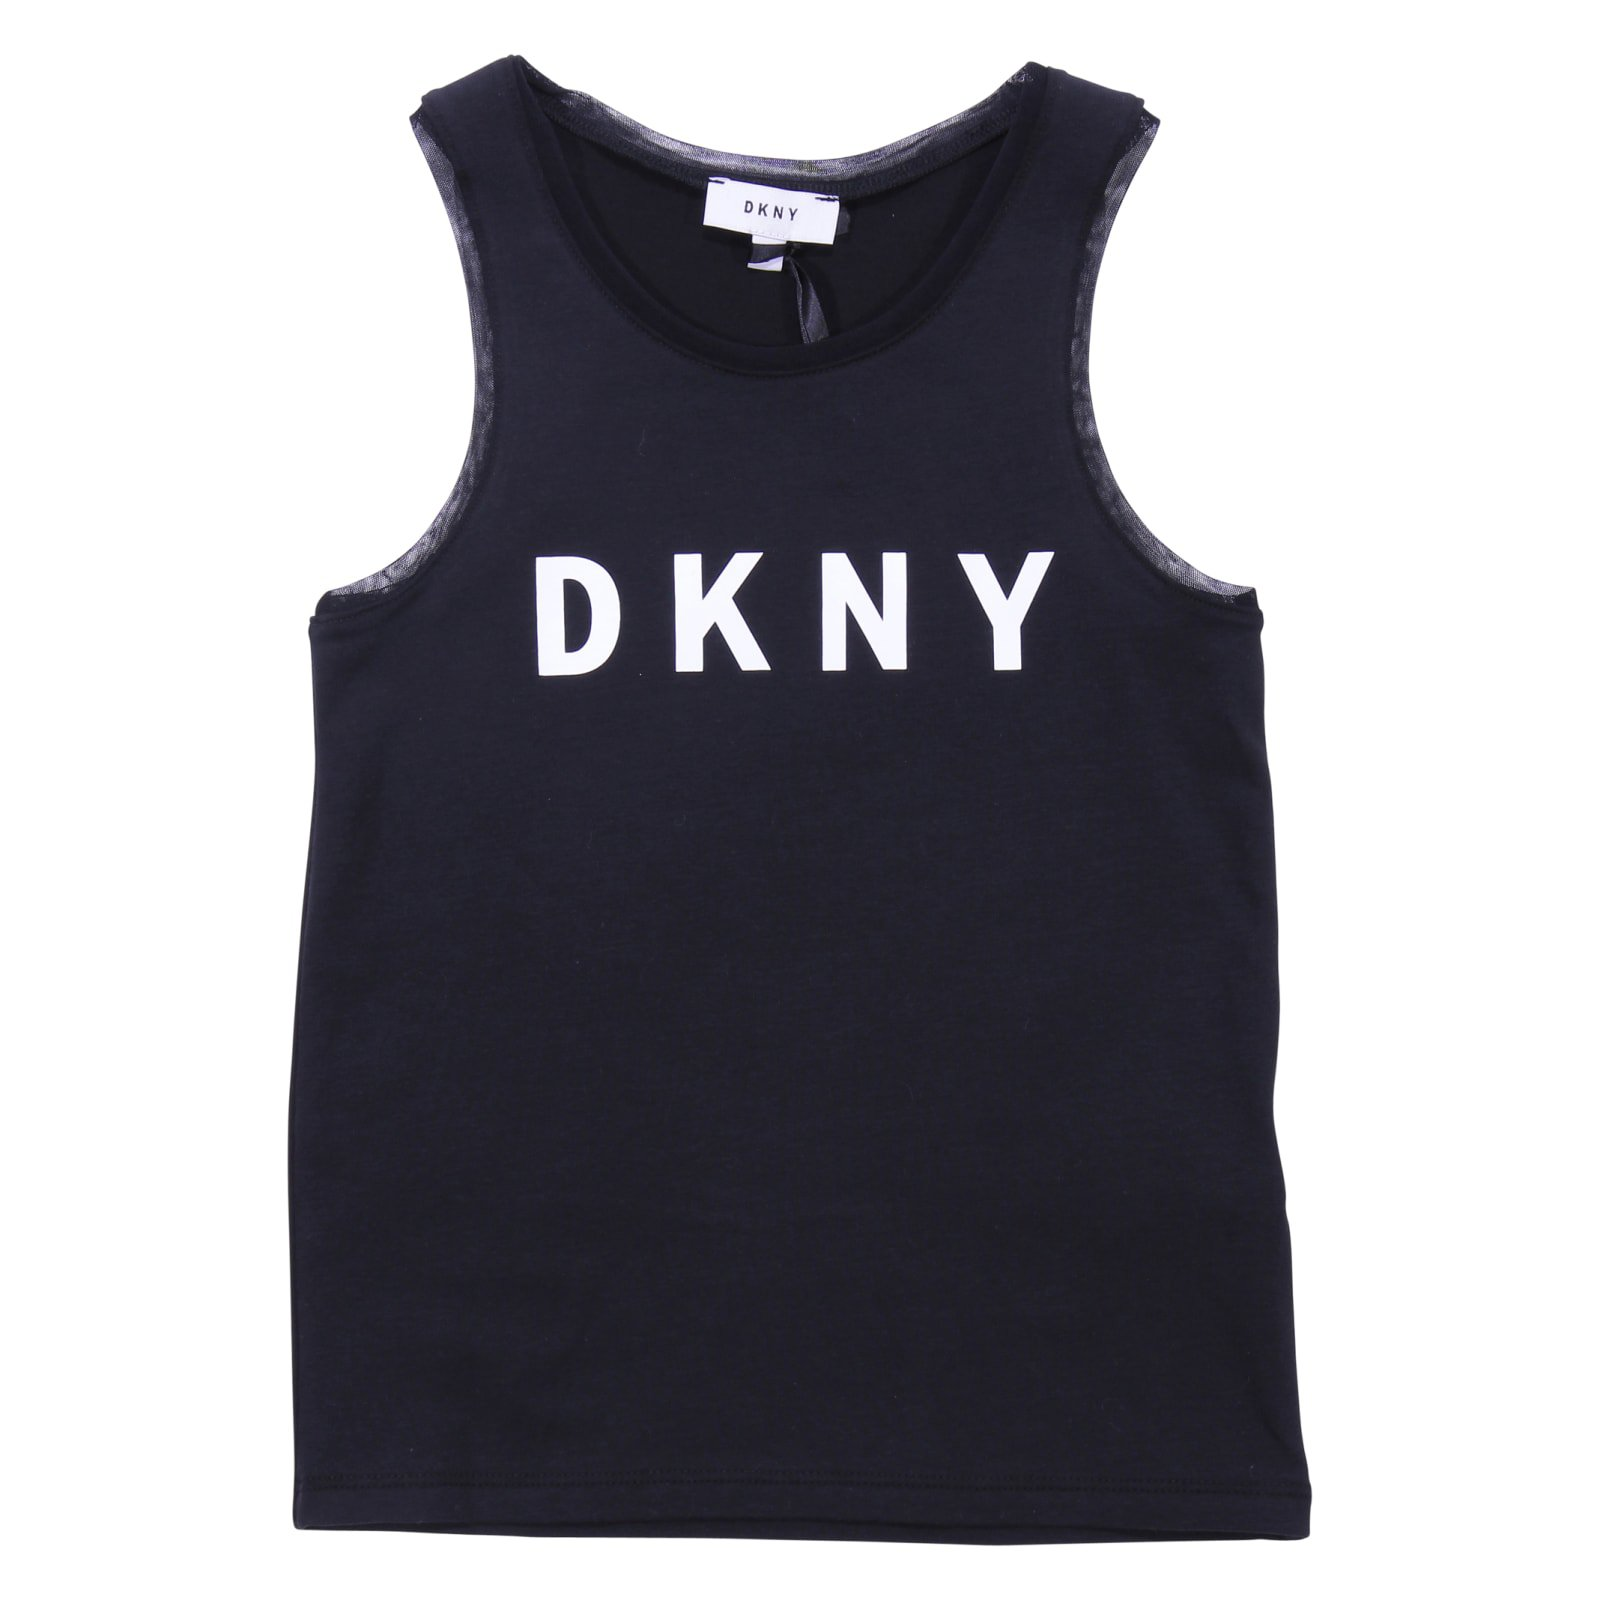 DKNY Black Cotton Jersey Logo Tank Top